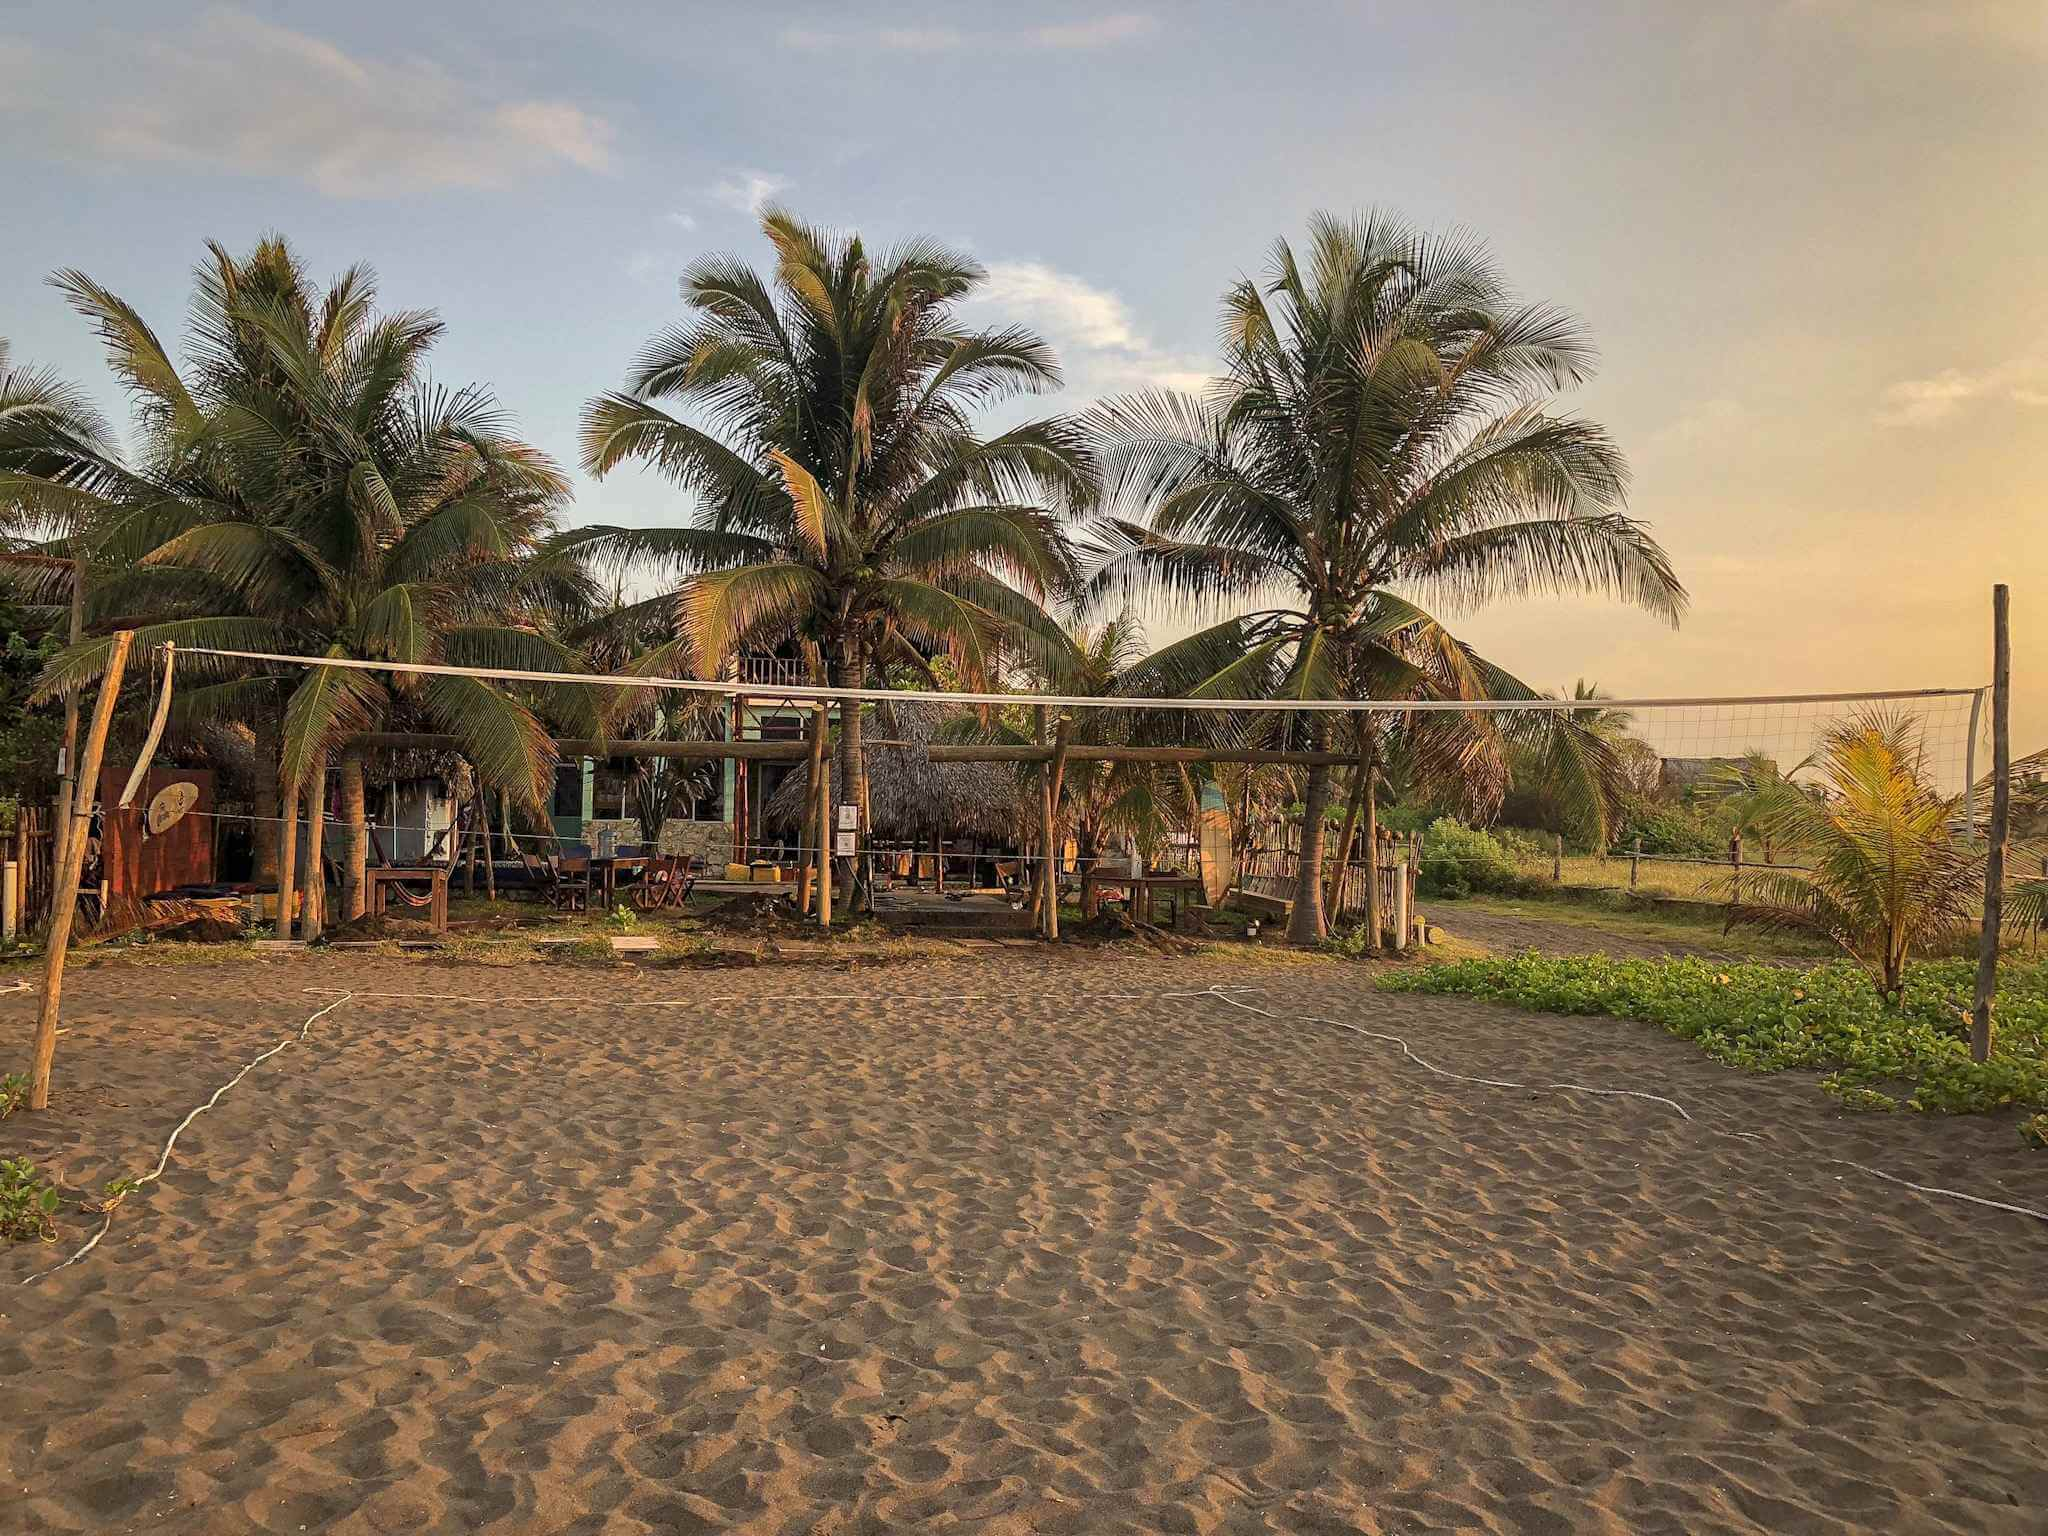 El Paredon - The Driftwood Surfer hostel